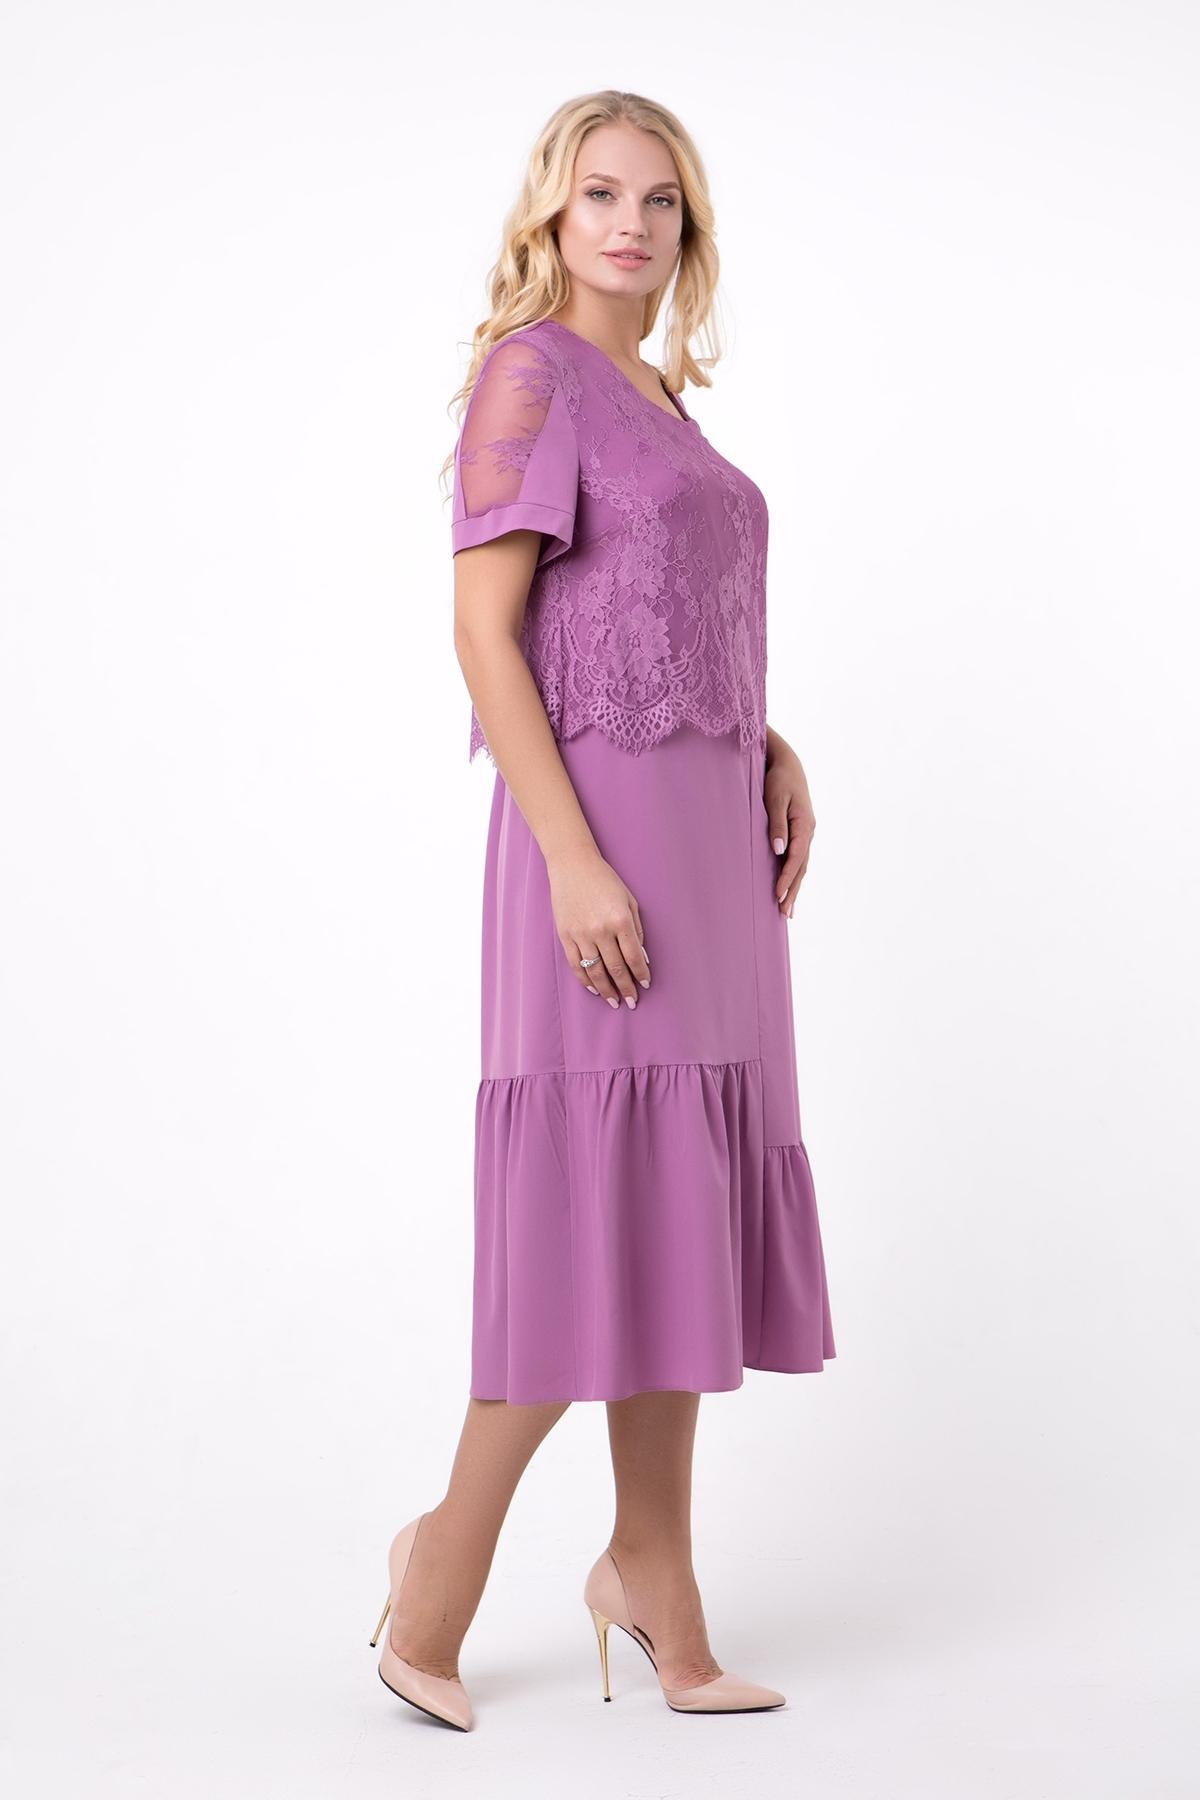 Платье Долорес (фрез)